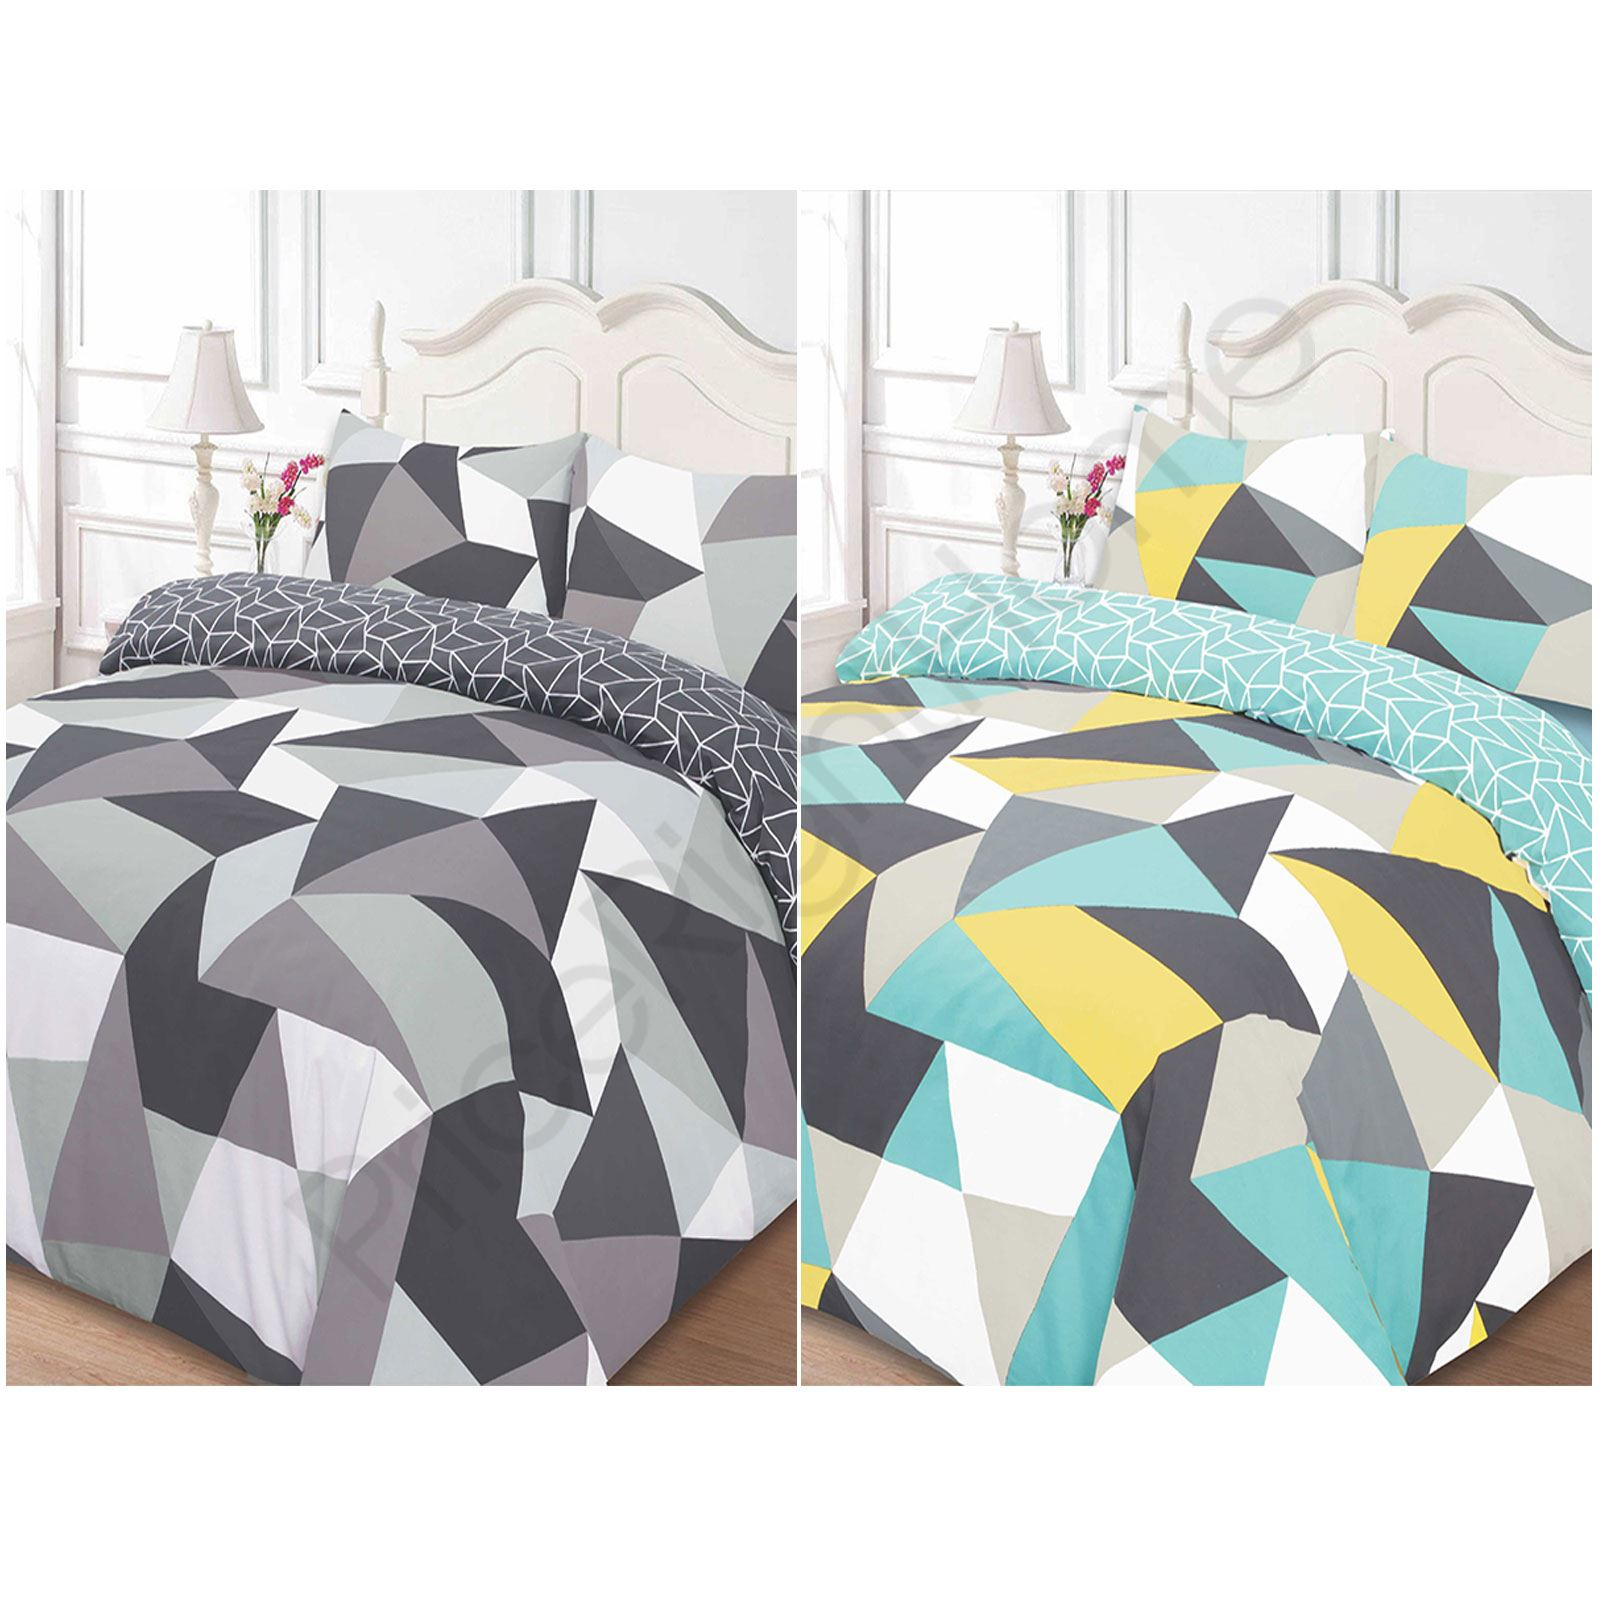 full comforter sets duvet chelsea bed bedding fluffy black and size white set gray geometric cover dark king of biltmore all yellow